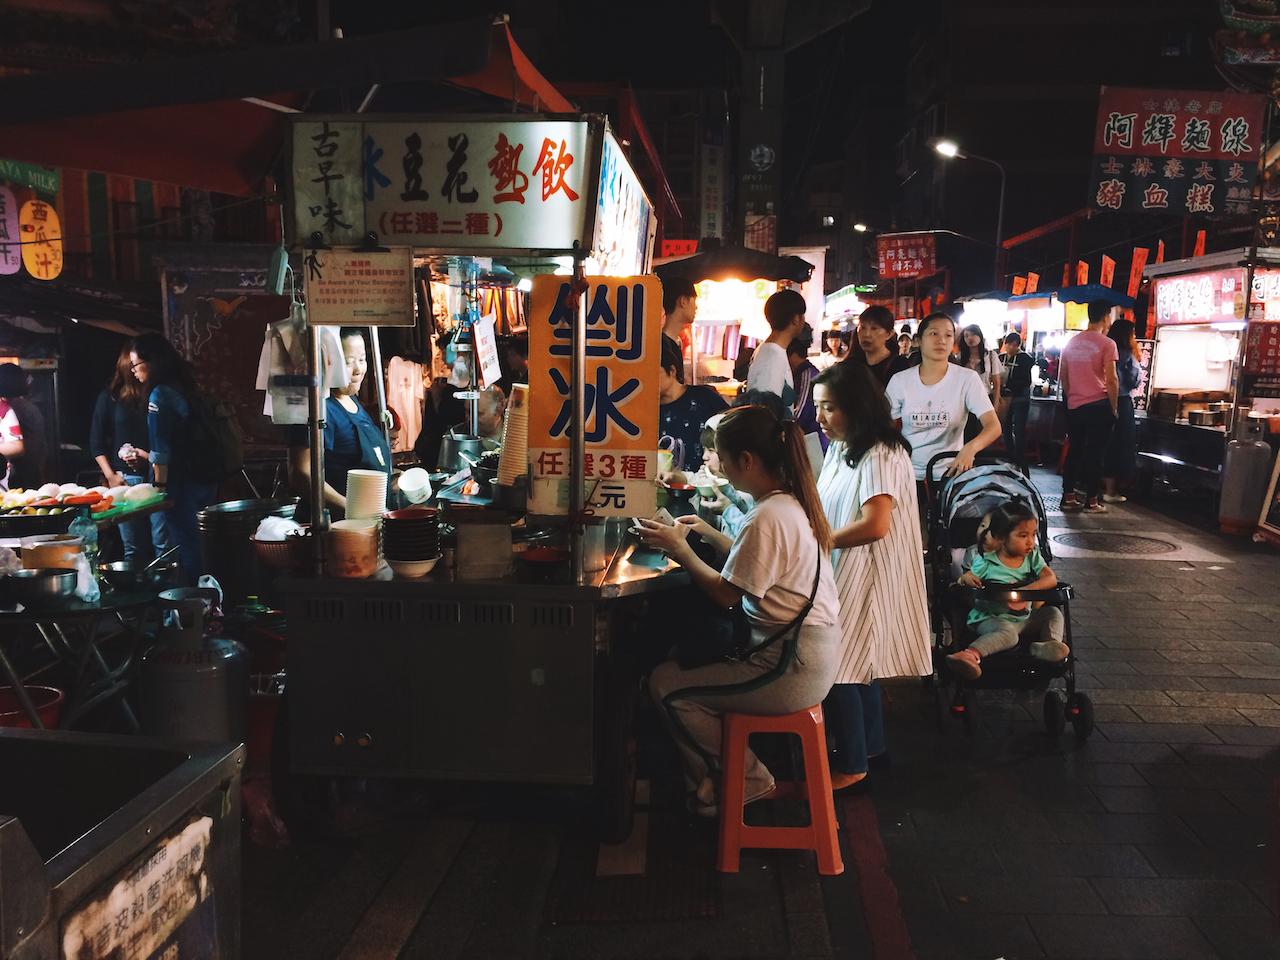 Тайвань без визы: ночной рынок в Тайбэе